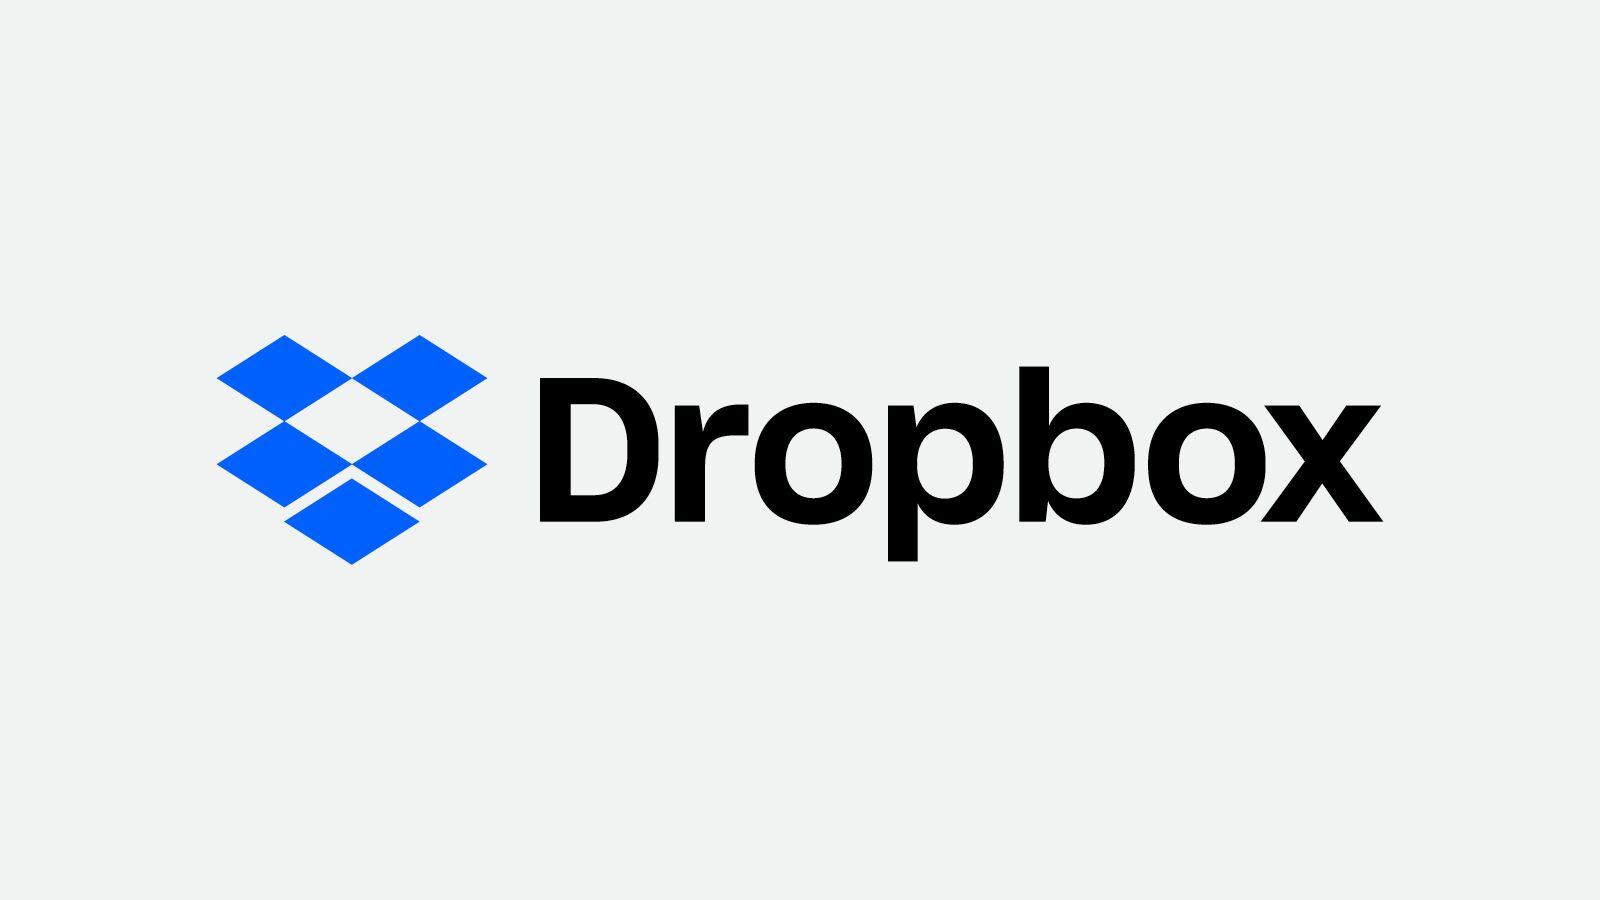 Il logo del cloud storage Dropbox